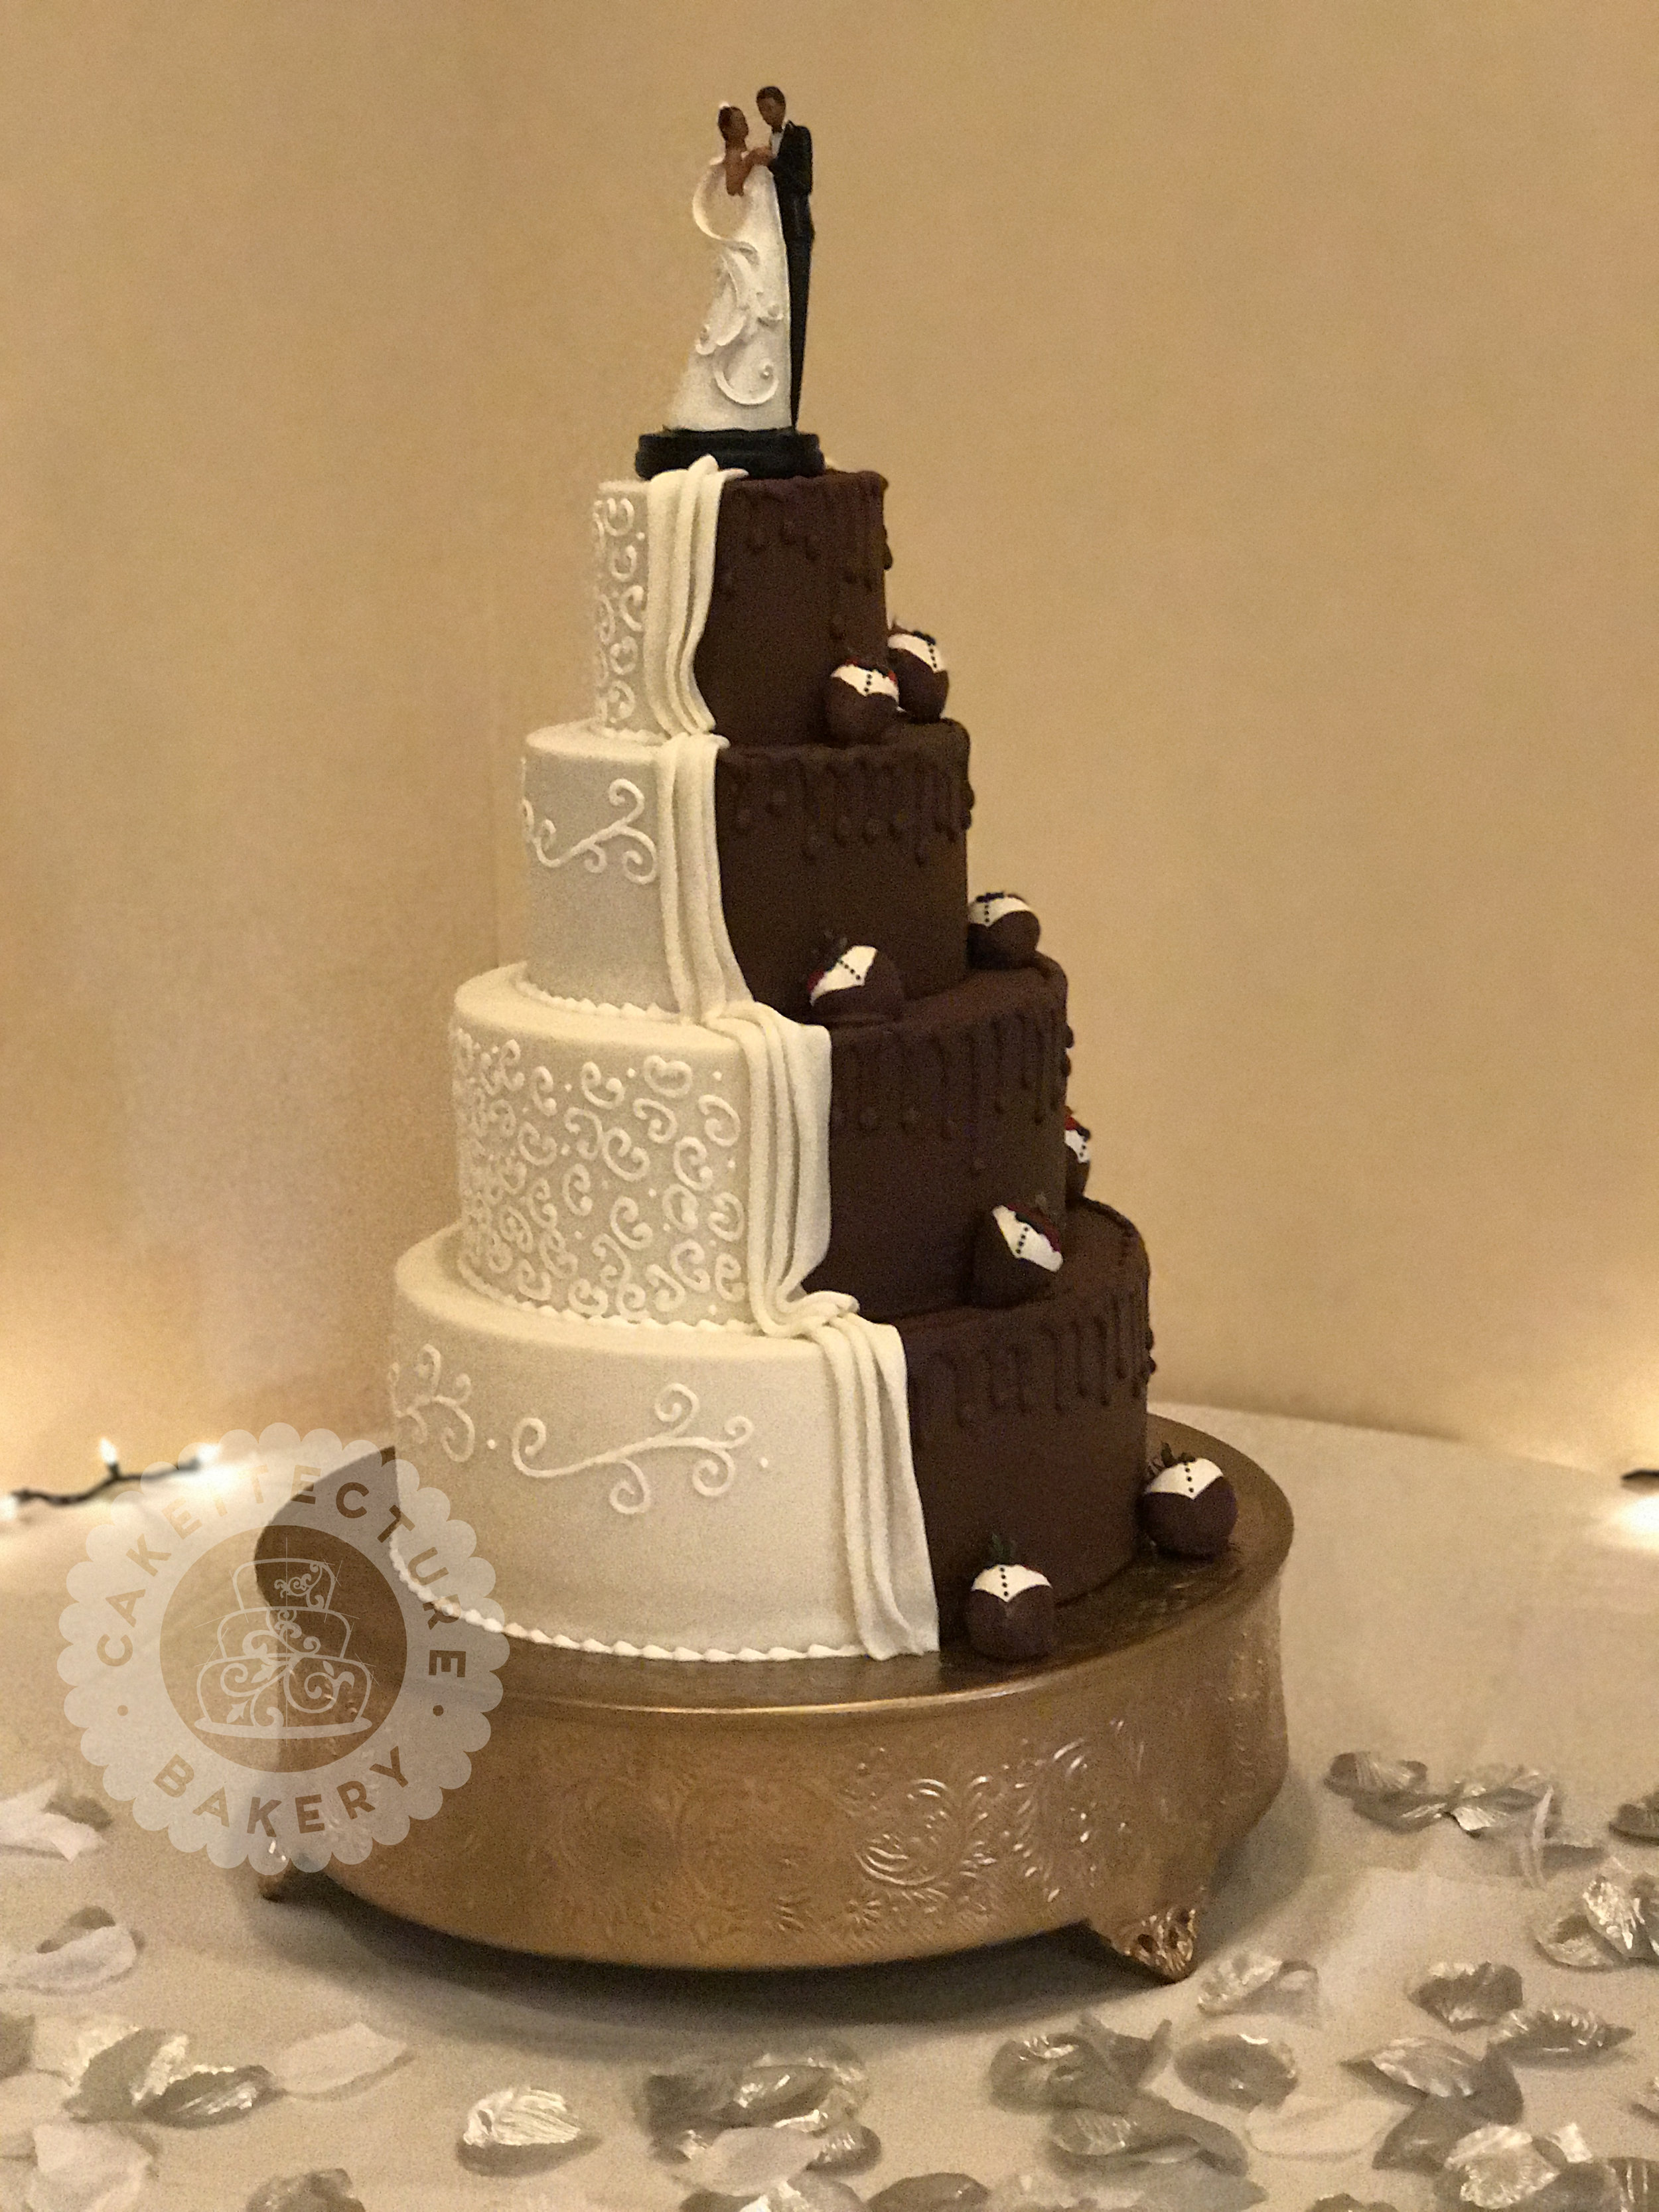 Cakeitecture Bakery 1704 split wedding cake .jpg